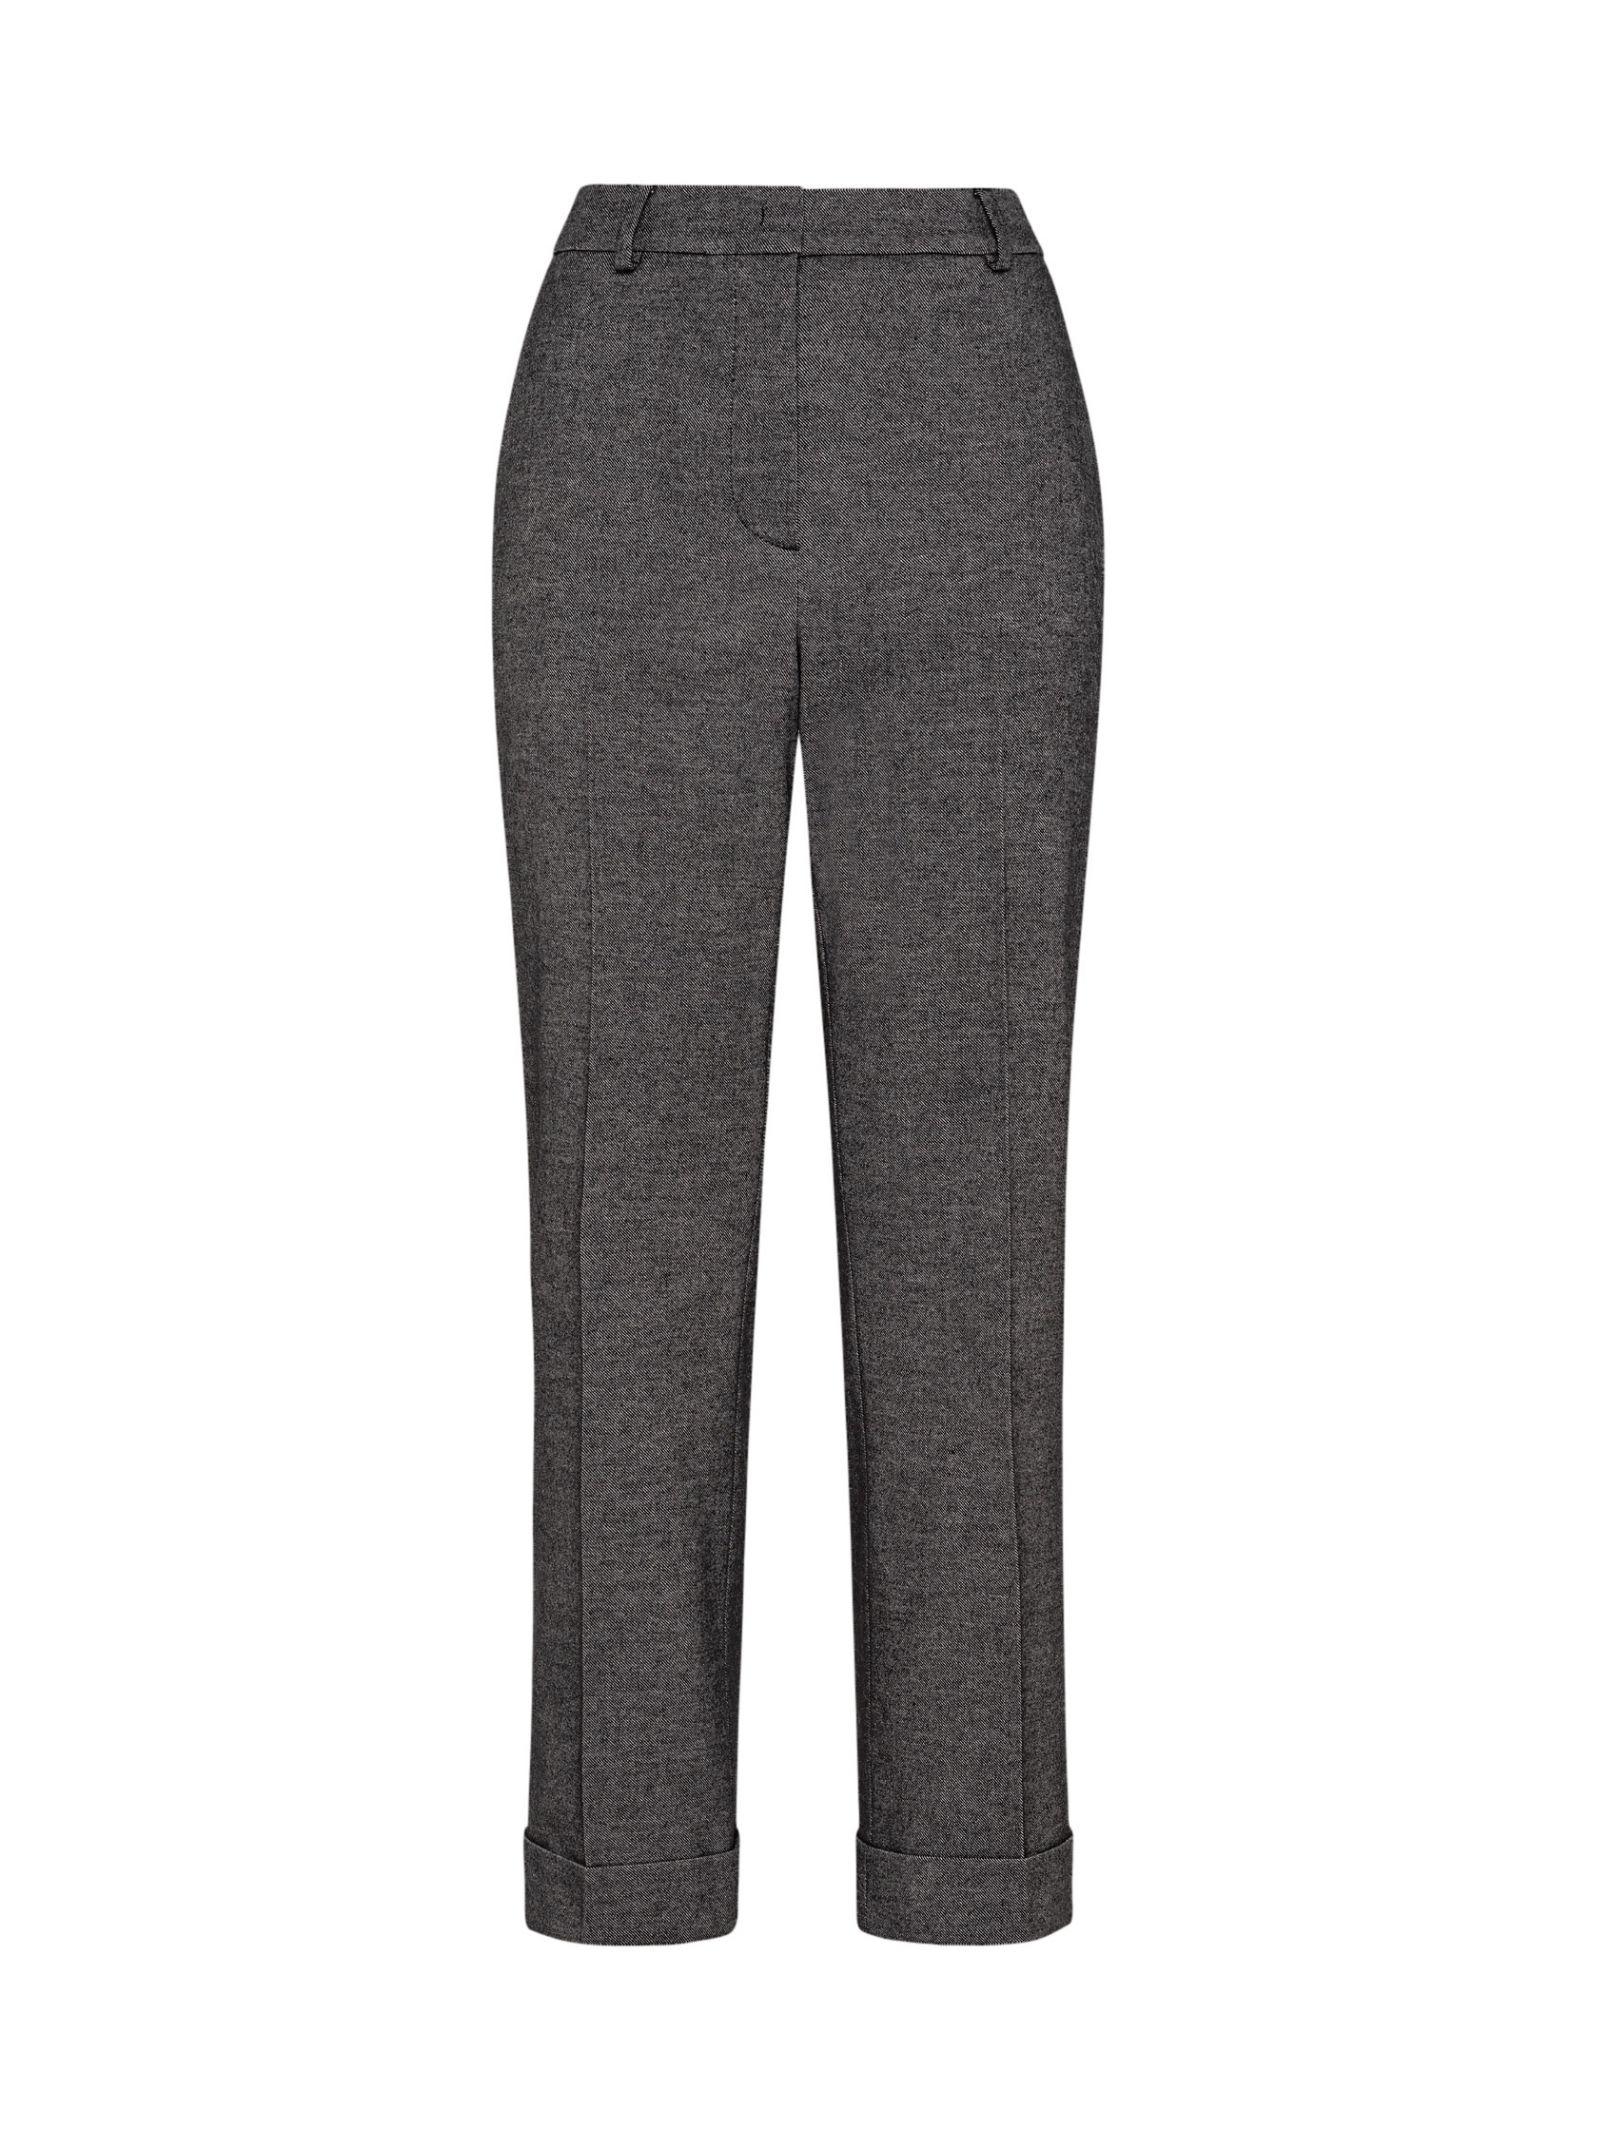 PANTALONE CON RISVOLTO SEVENTY   Pantalone   PT1018240245999